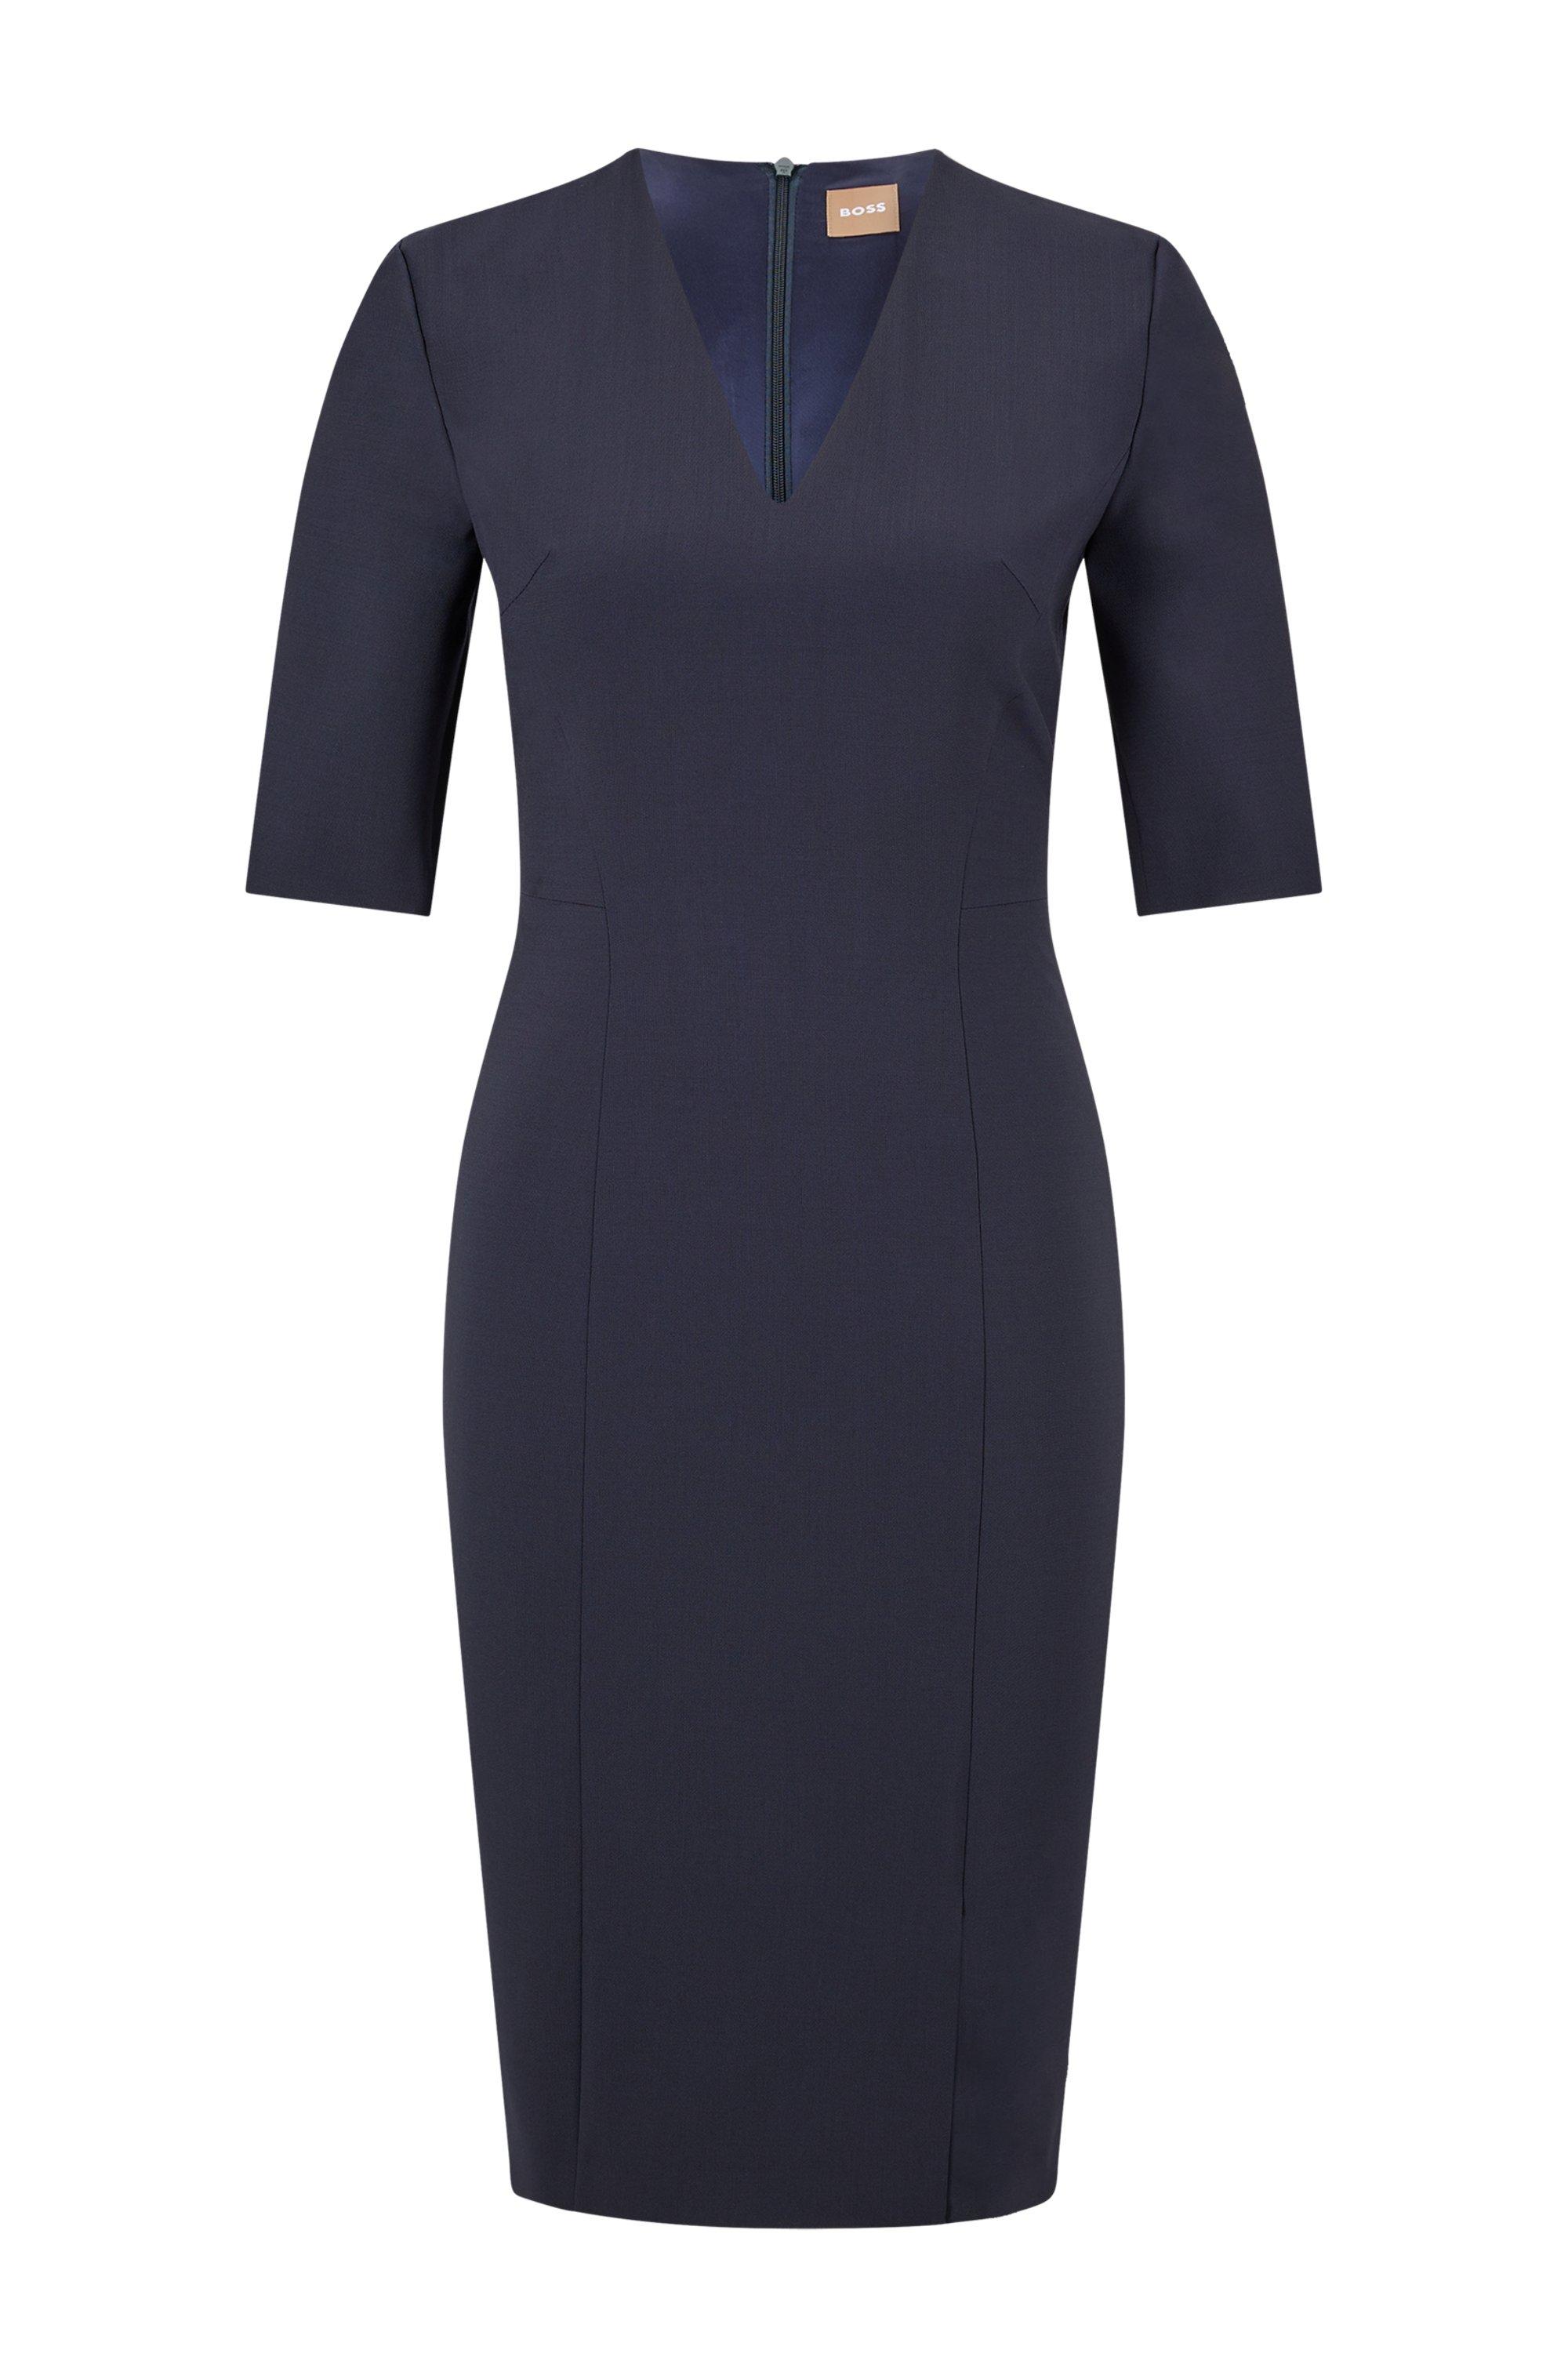 Vestido de mangas cortas en lana elástica italiana, Azul oscuro